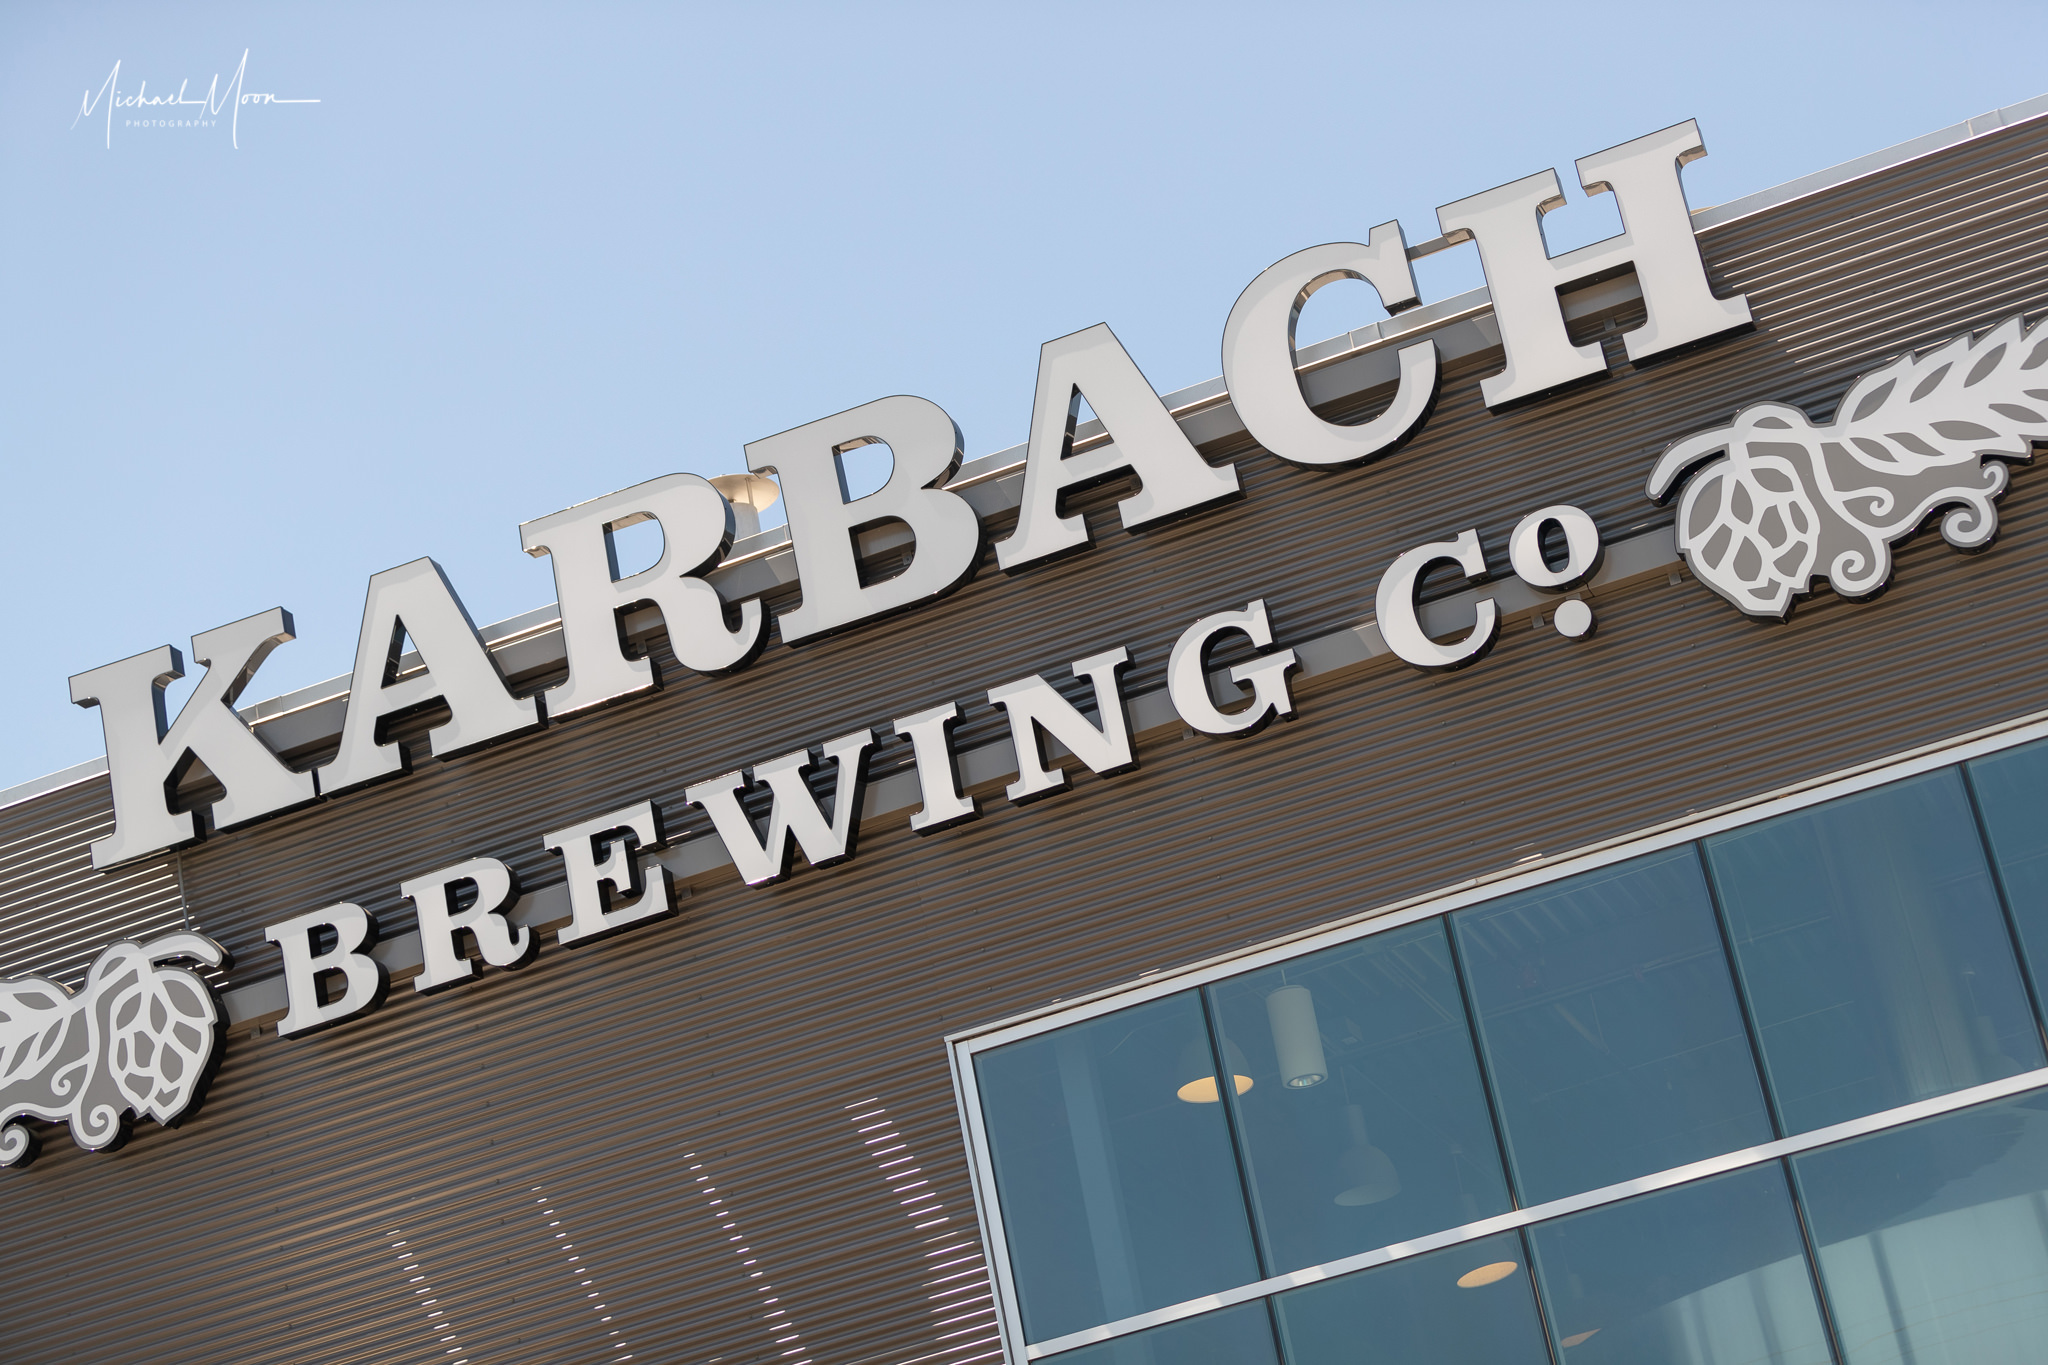 KarbachCrawfishFestival-2105.jpg